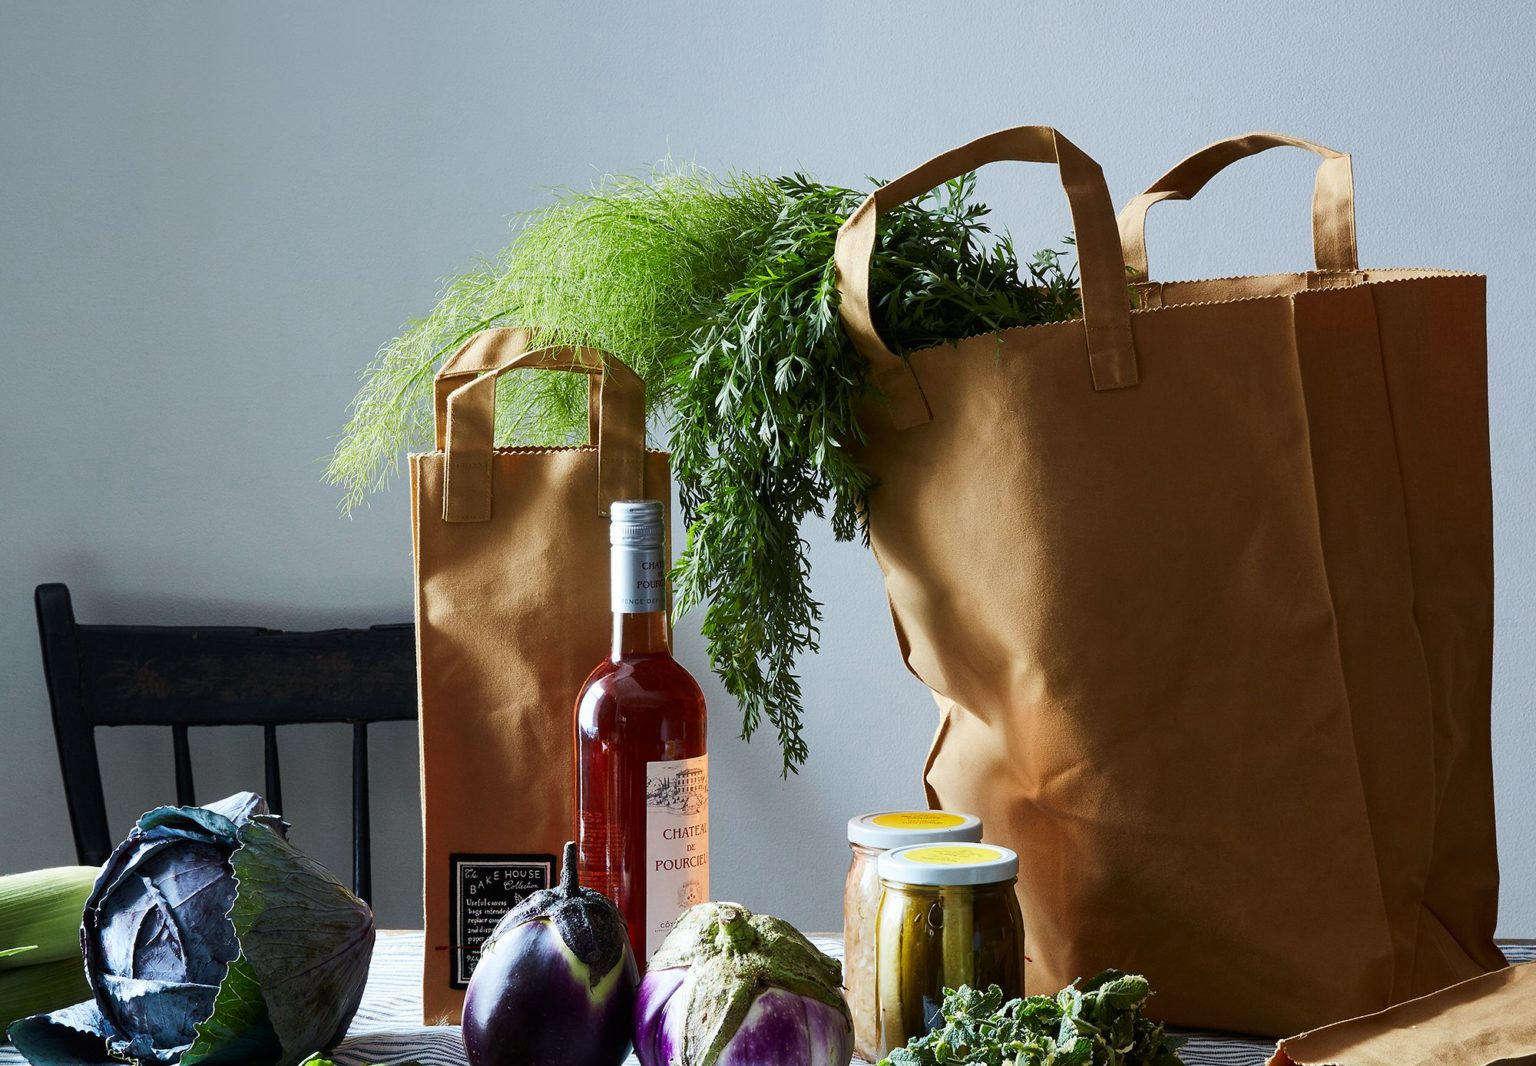 Peg and Awl Bake House Market Bags